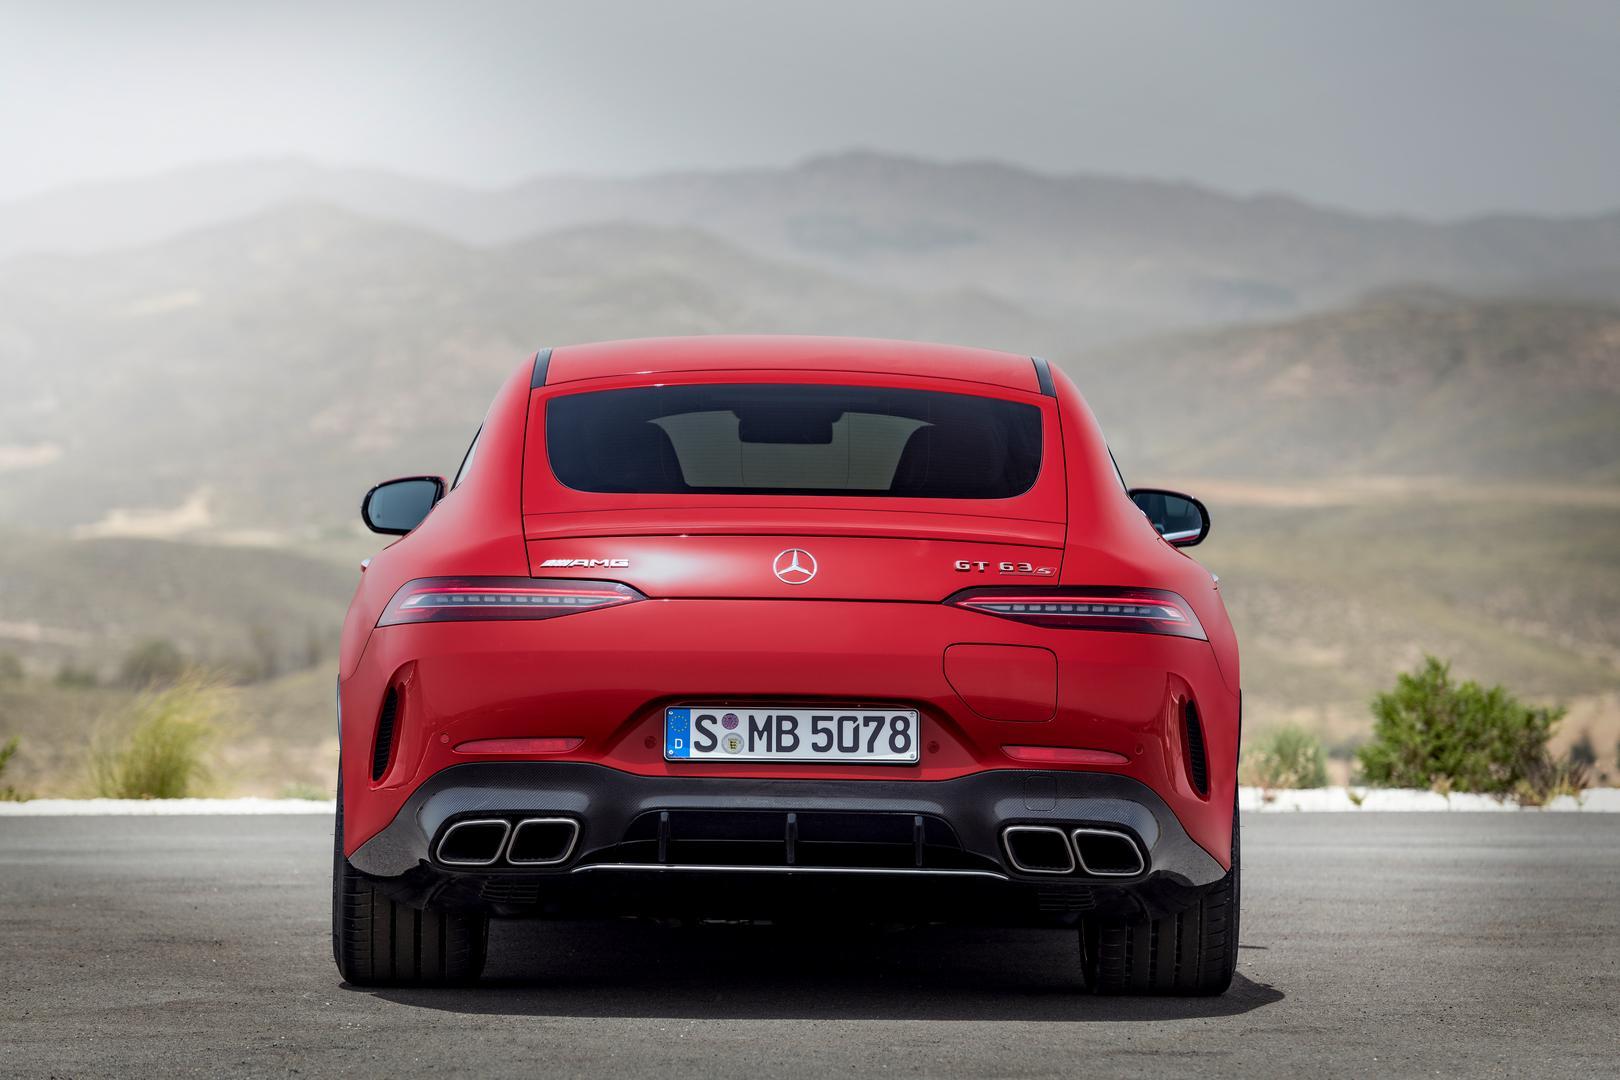 2022 Mercedes-AMG GT 63 S E PERFORMANCE (4MATIC+), 2021Mercedes-AMG GT 63 S E PERFORMANCE rear